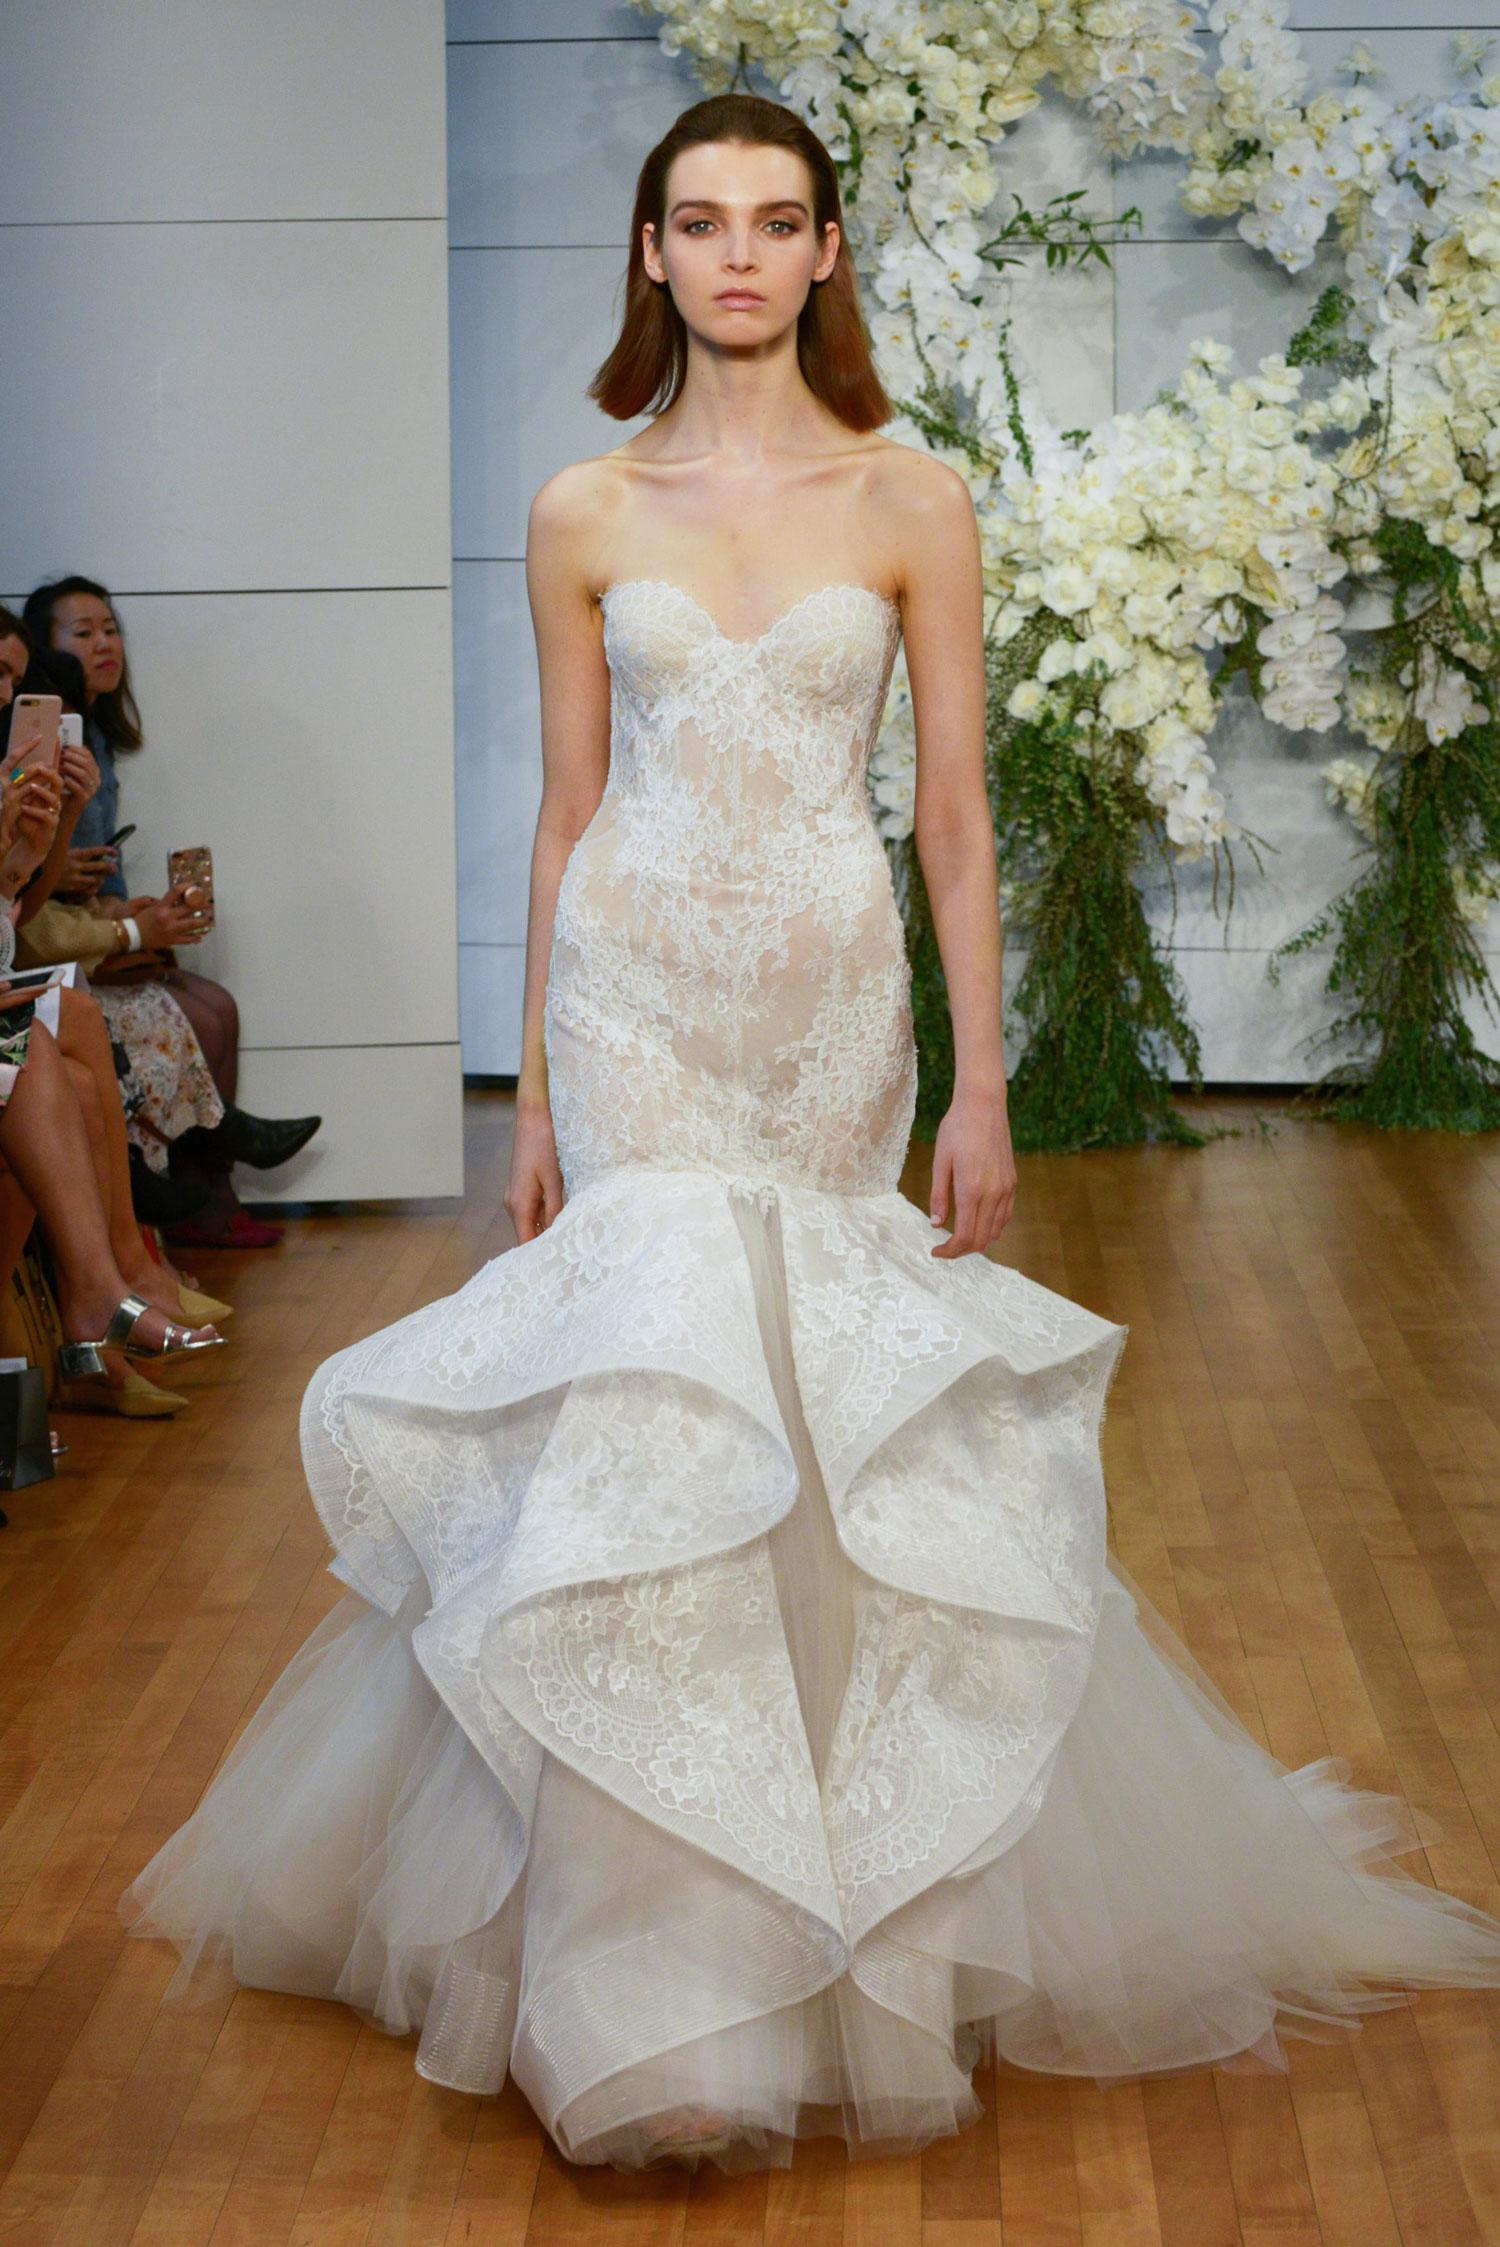 Monique Lhuillier Spring 2018 Emanuela - Inside Weddings